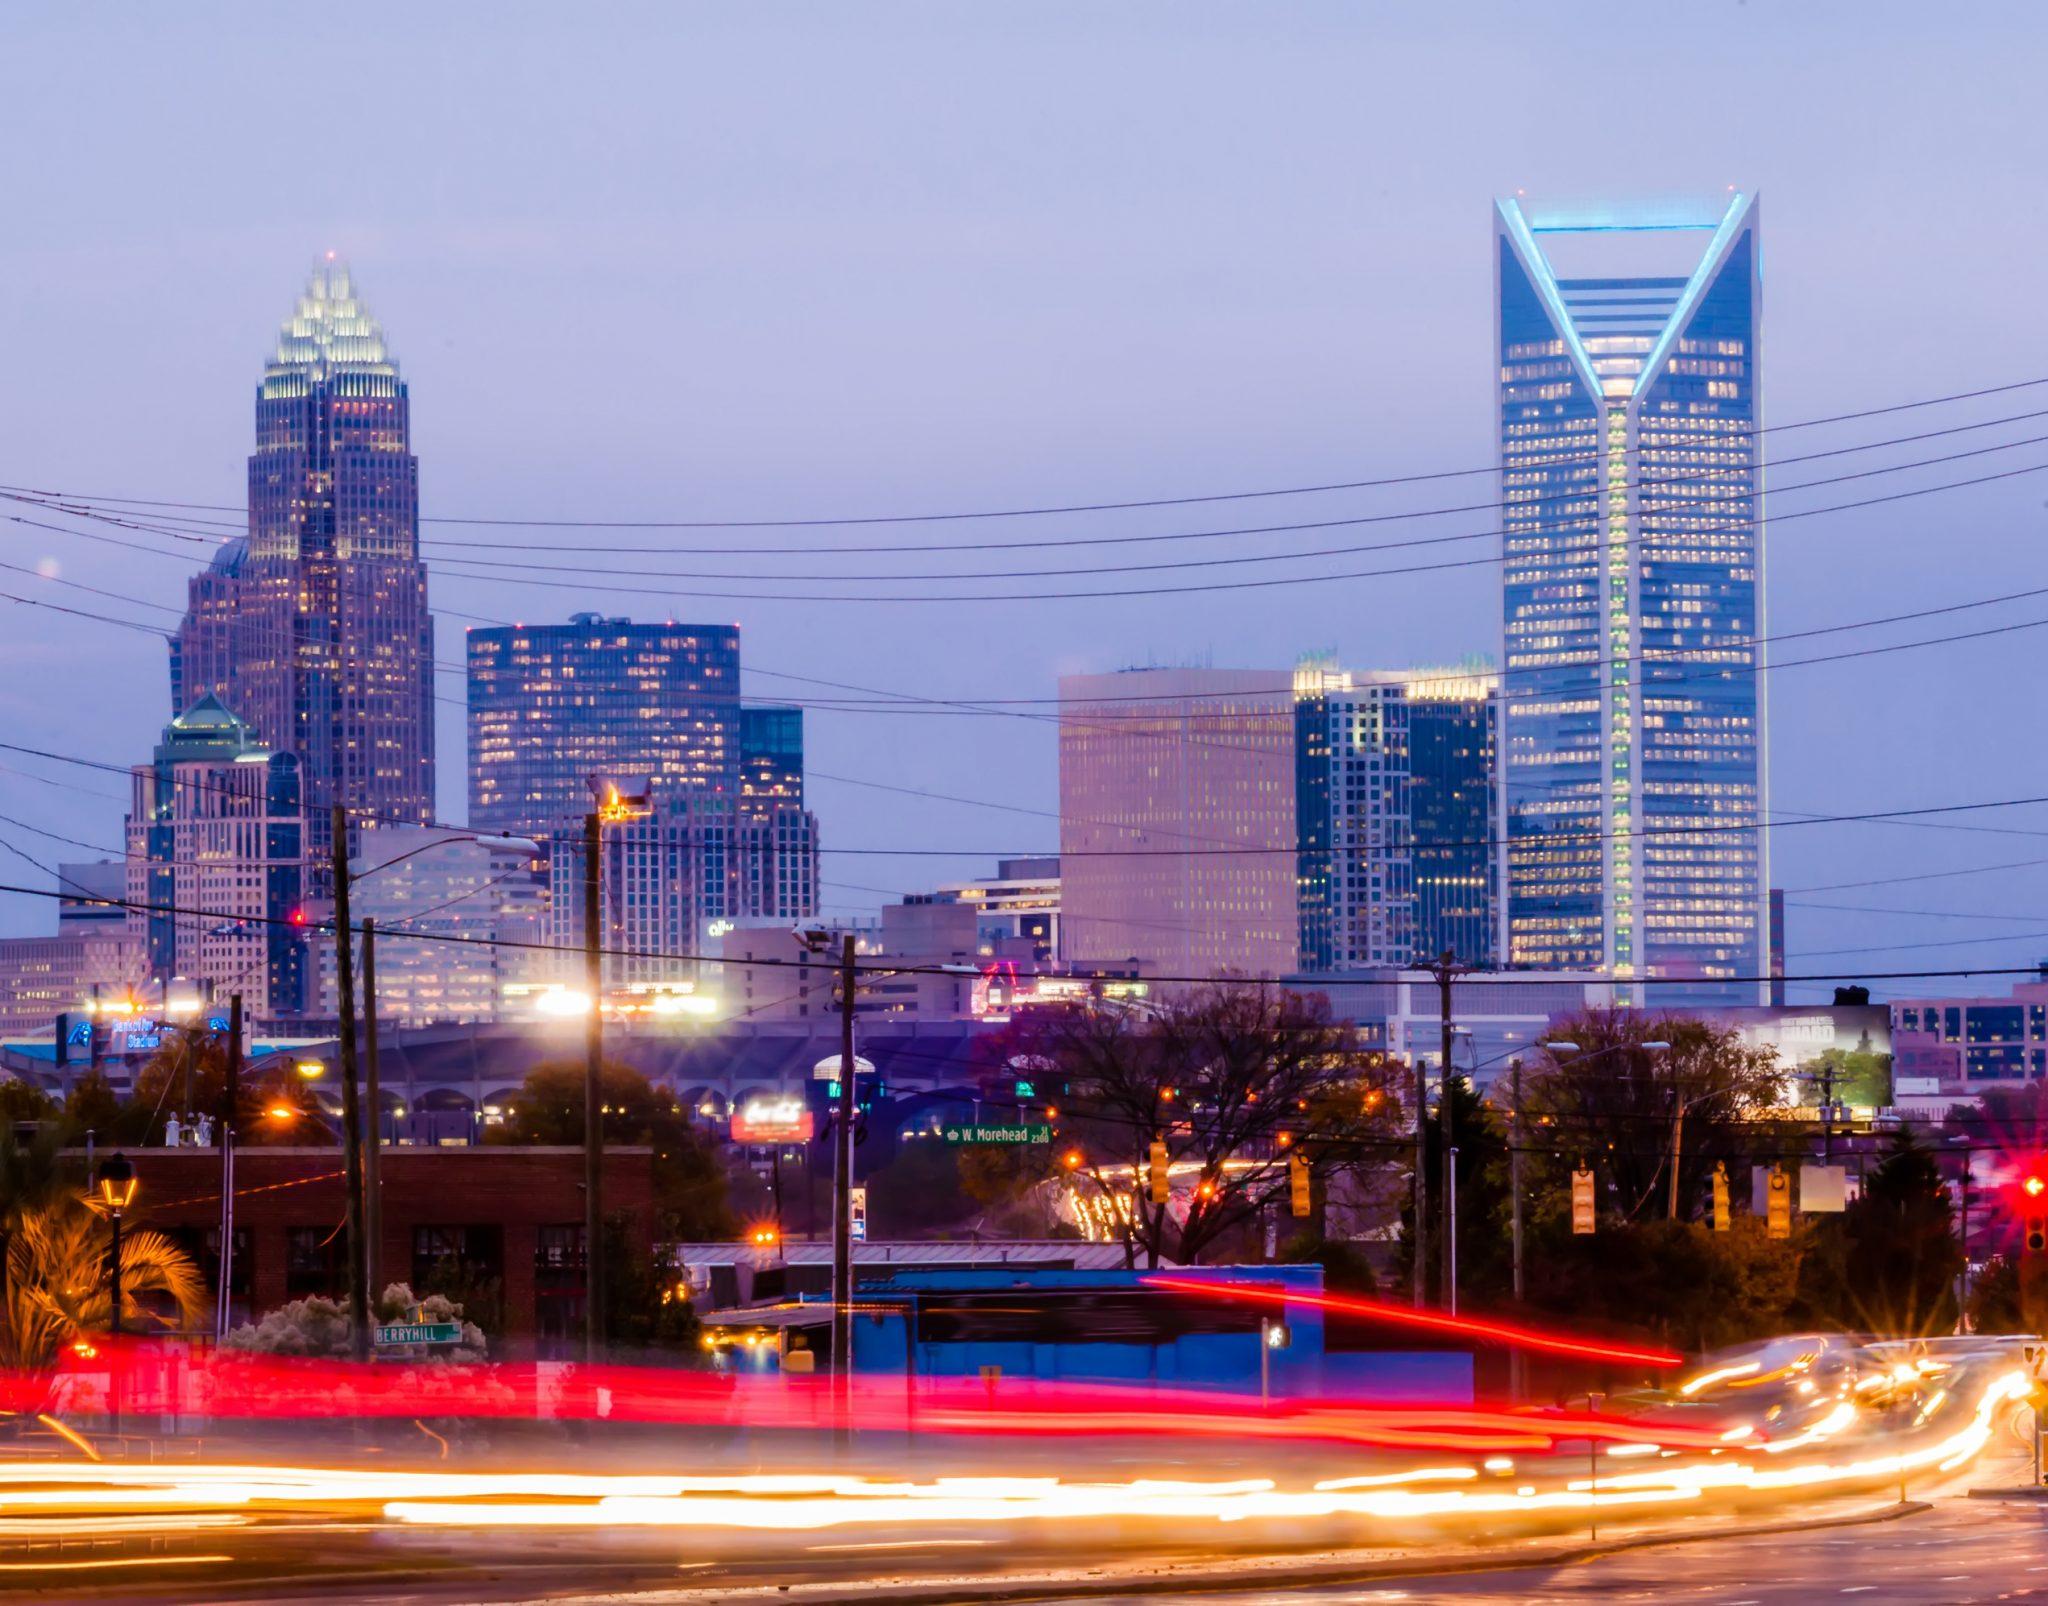 Getting around Charlotte